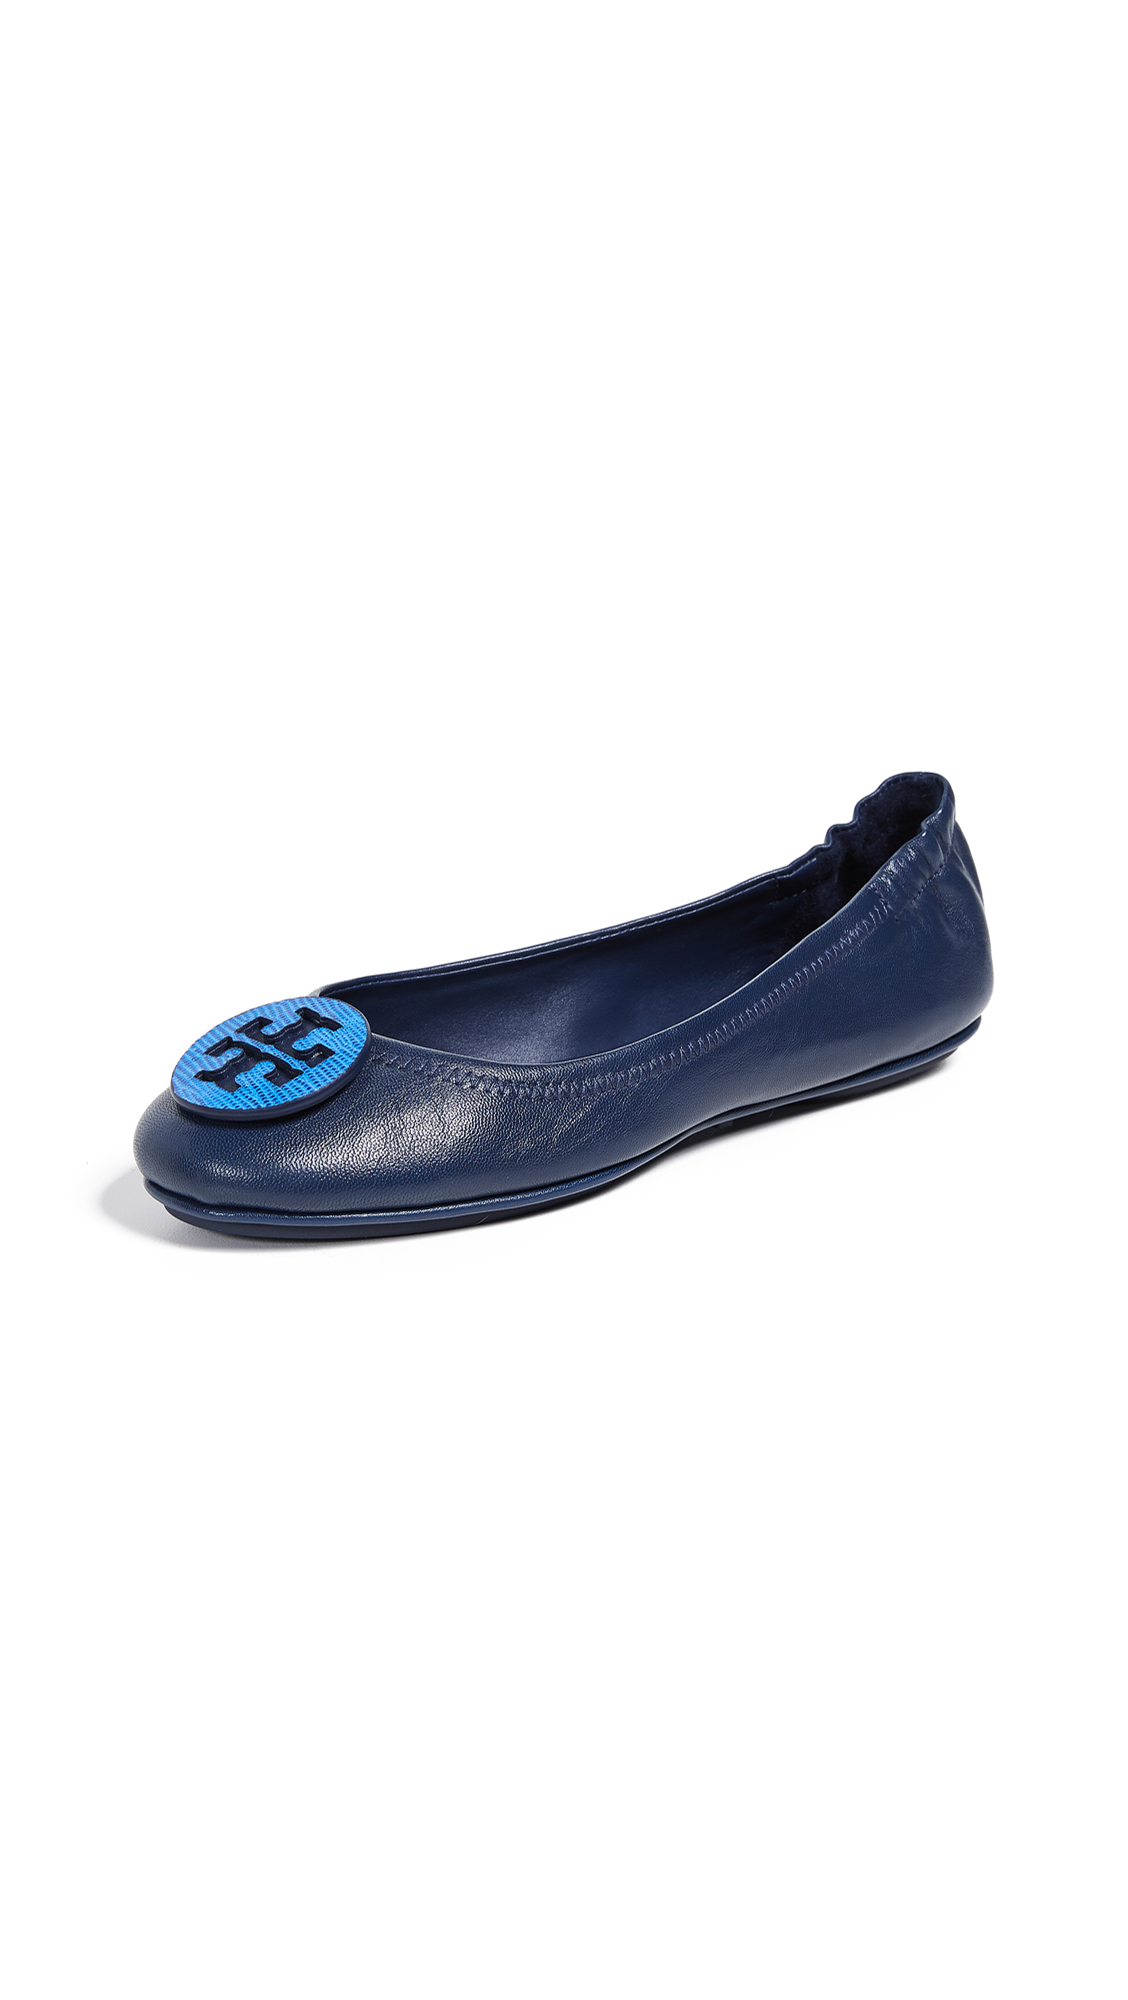 Tory Burch Minnie Travel Ballet Flats - Royal Navy/Bright Blue